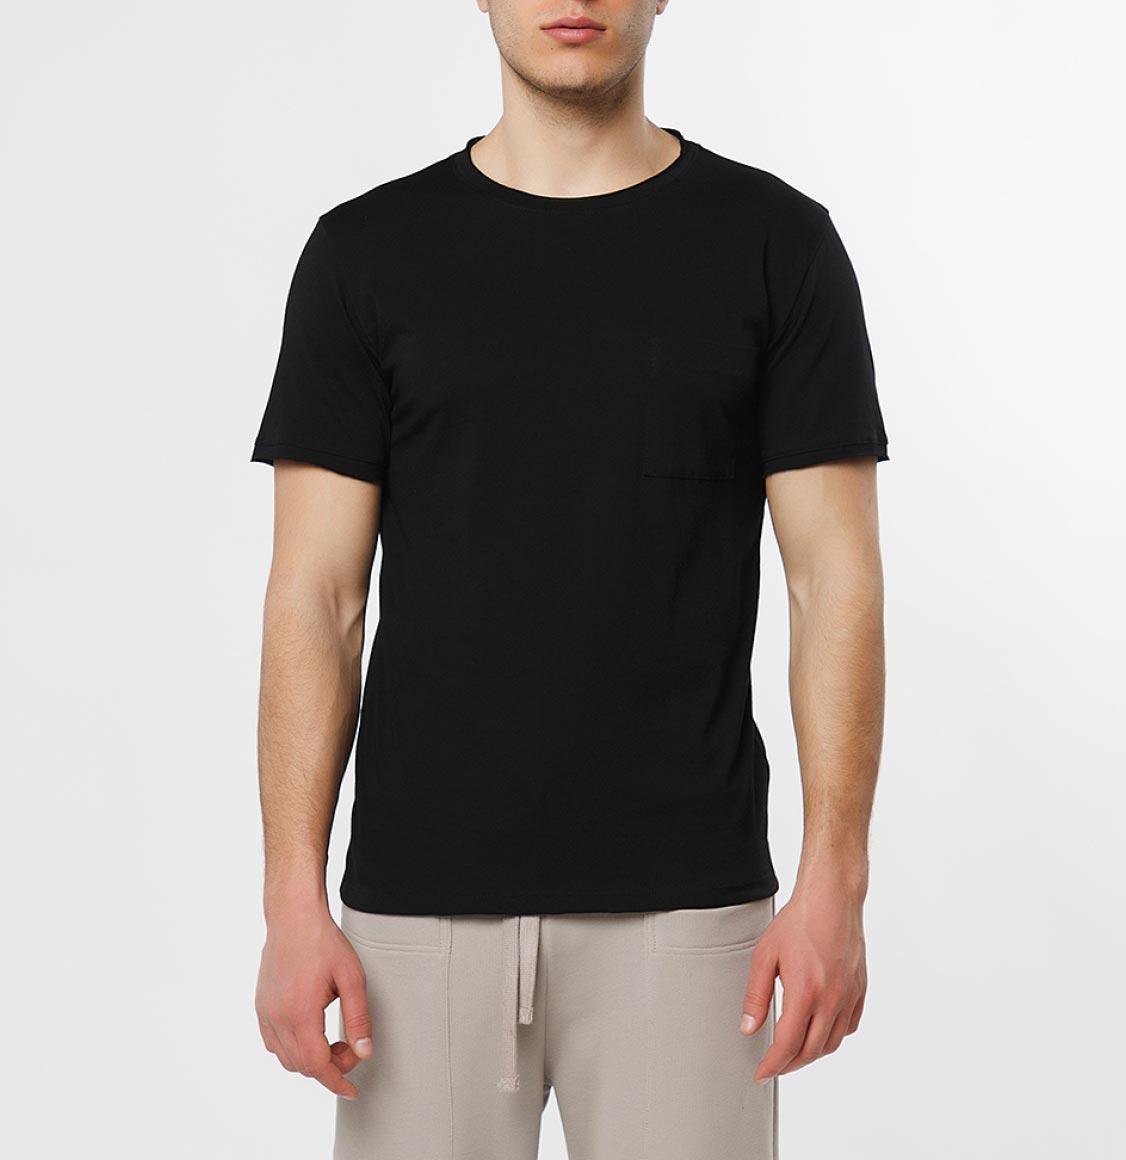 The Project Garments Slim Fit Pocket Crew Neck T-Shirt Black